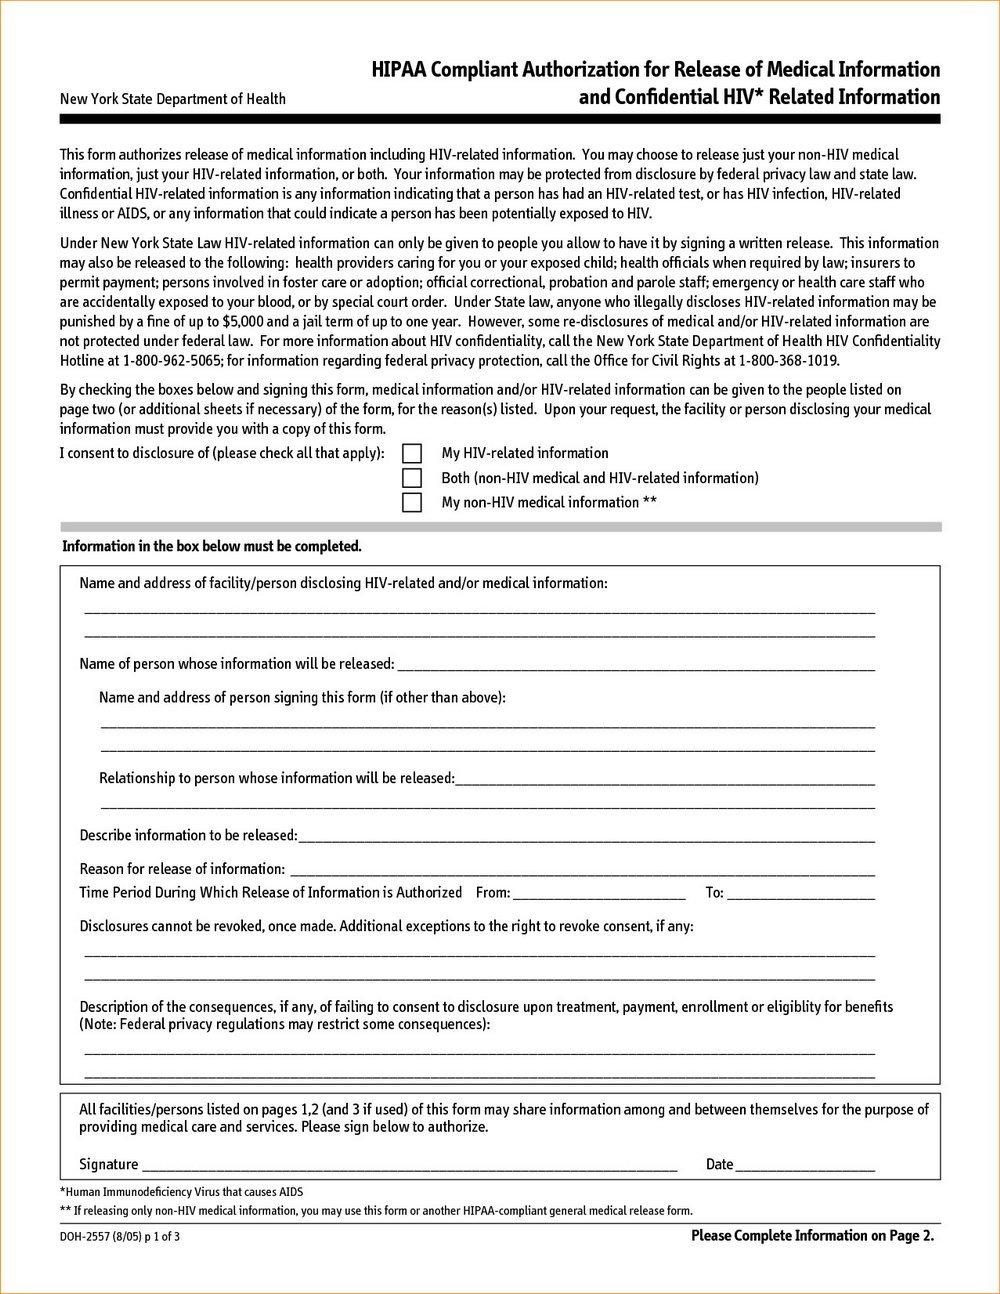 Hipaa Compliance forms for Employers Hipaa Pliance forms for Employers forms 5357